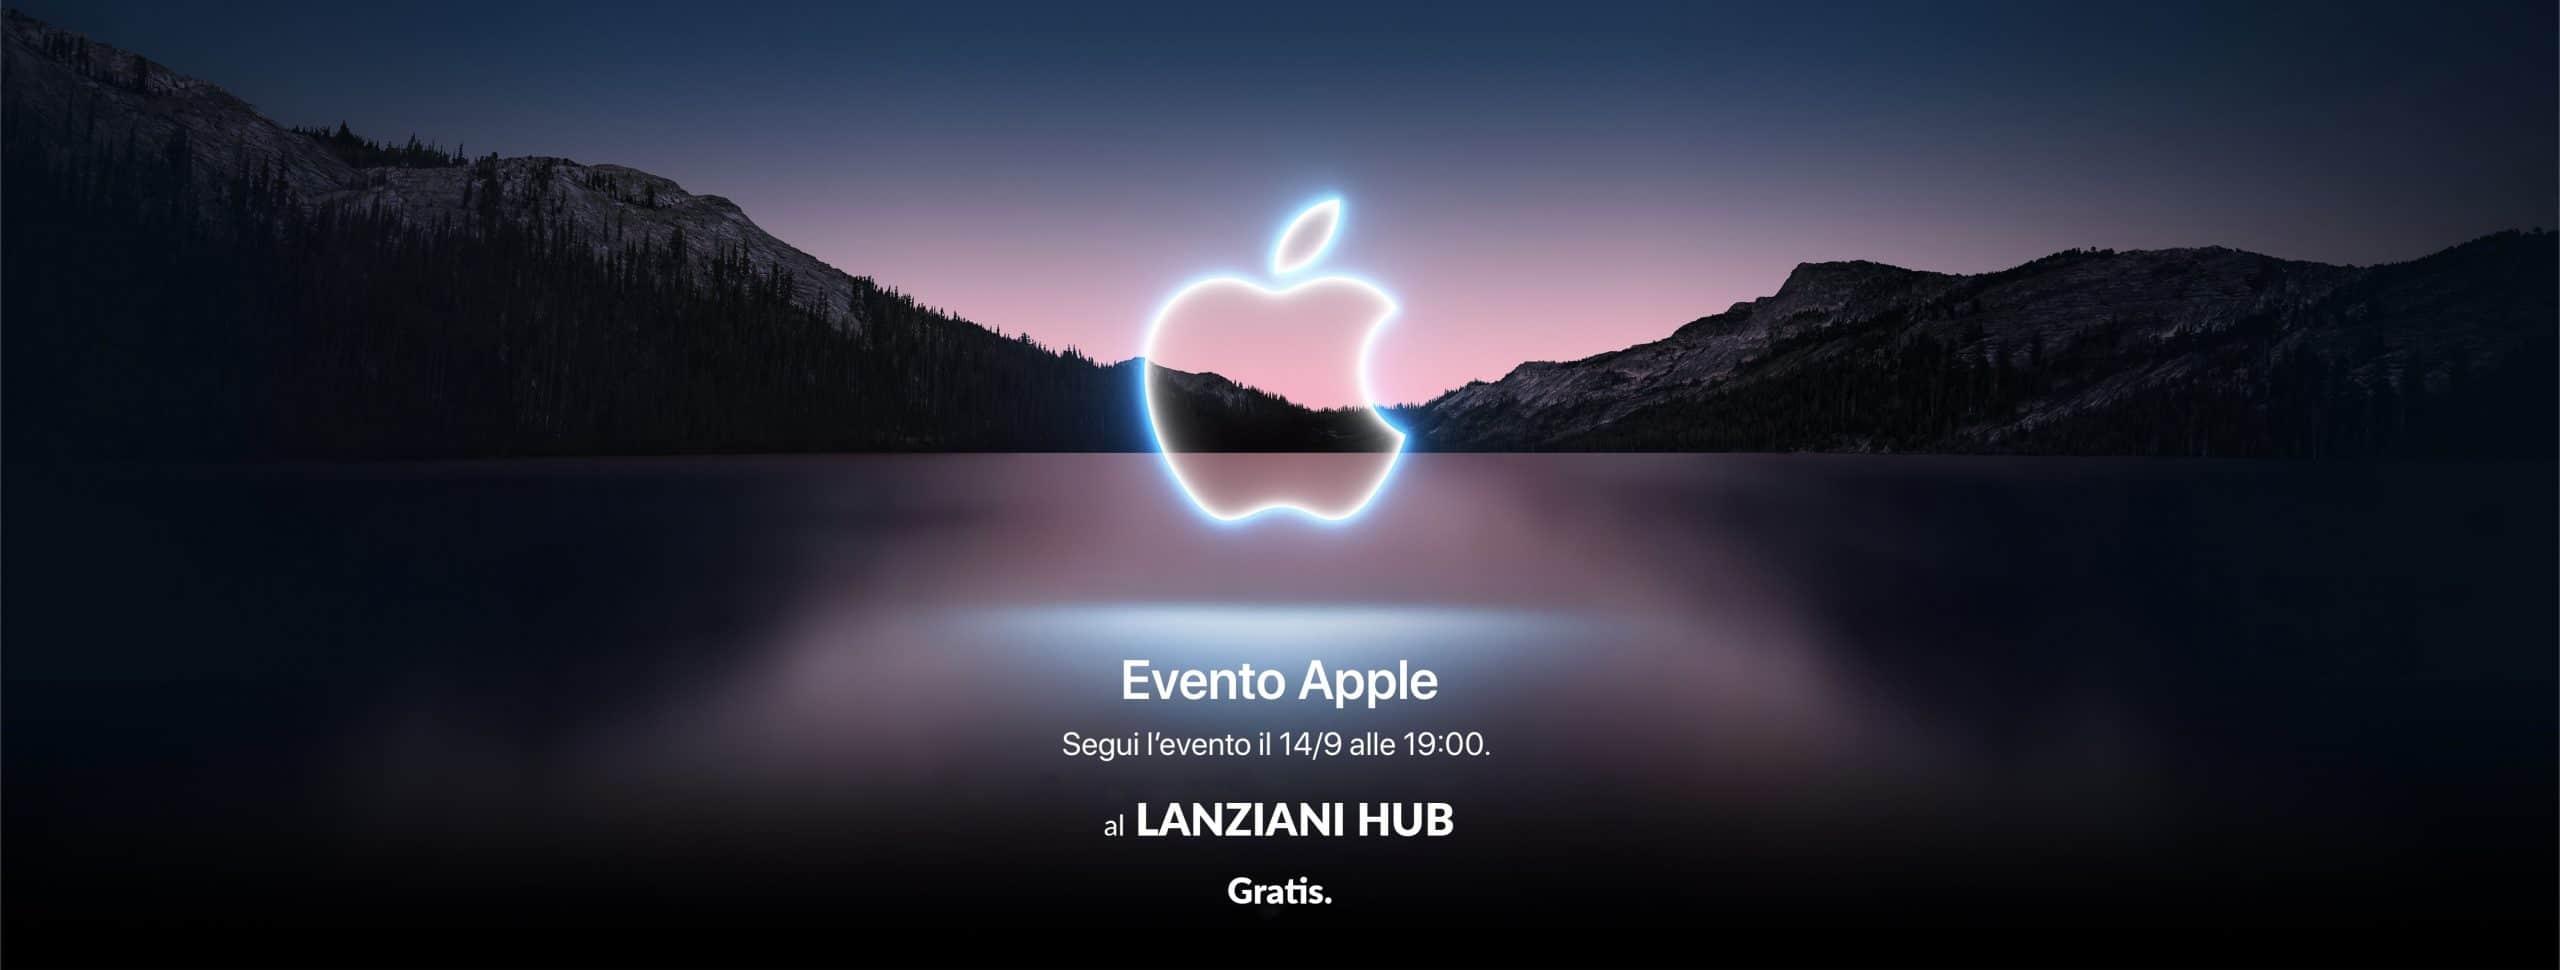 evento apple scaled